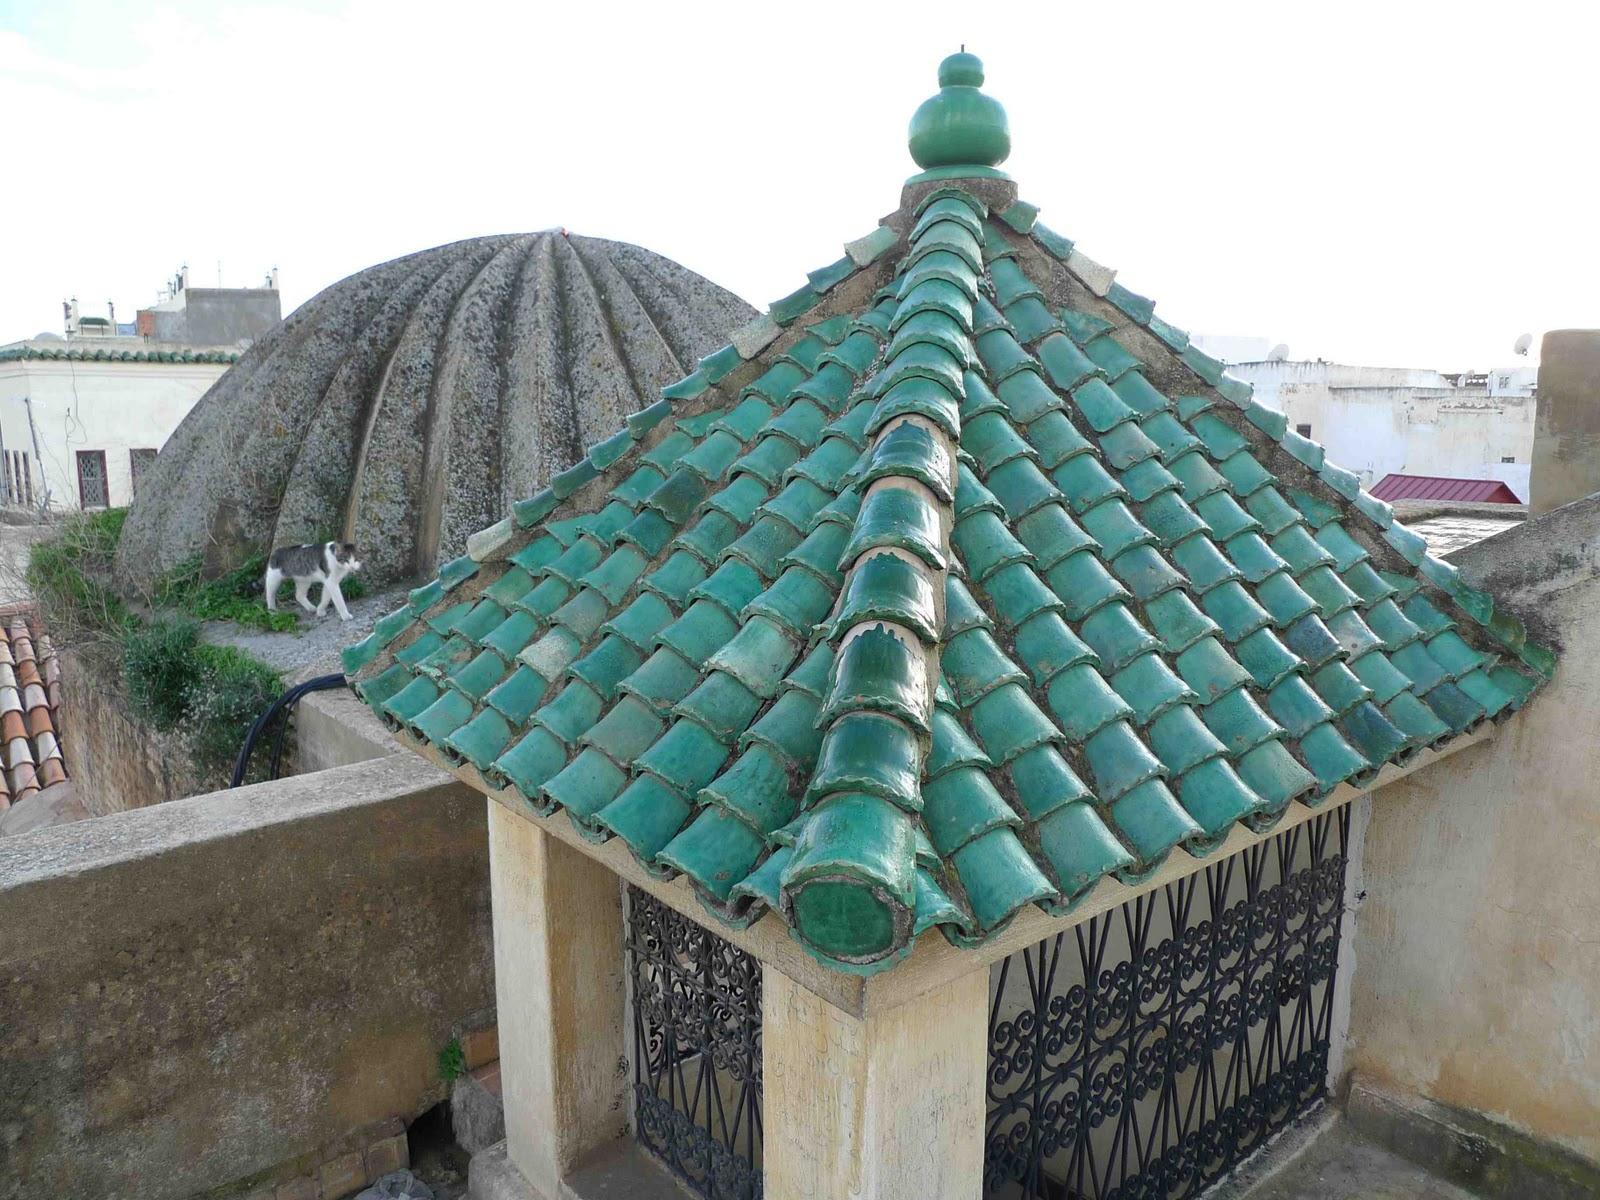 Tile Roof: Green Tile Roof Houses